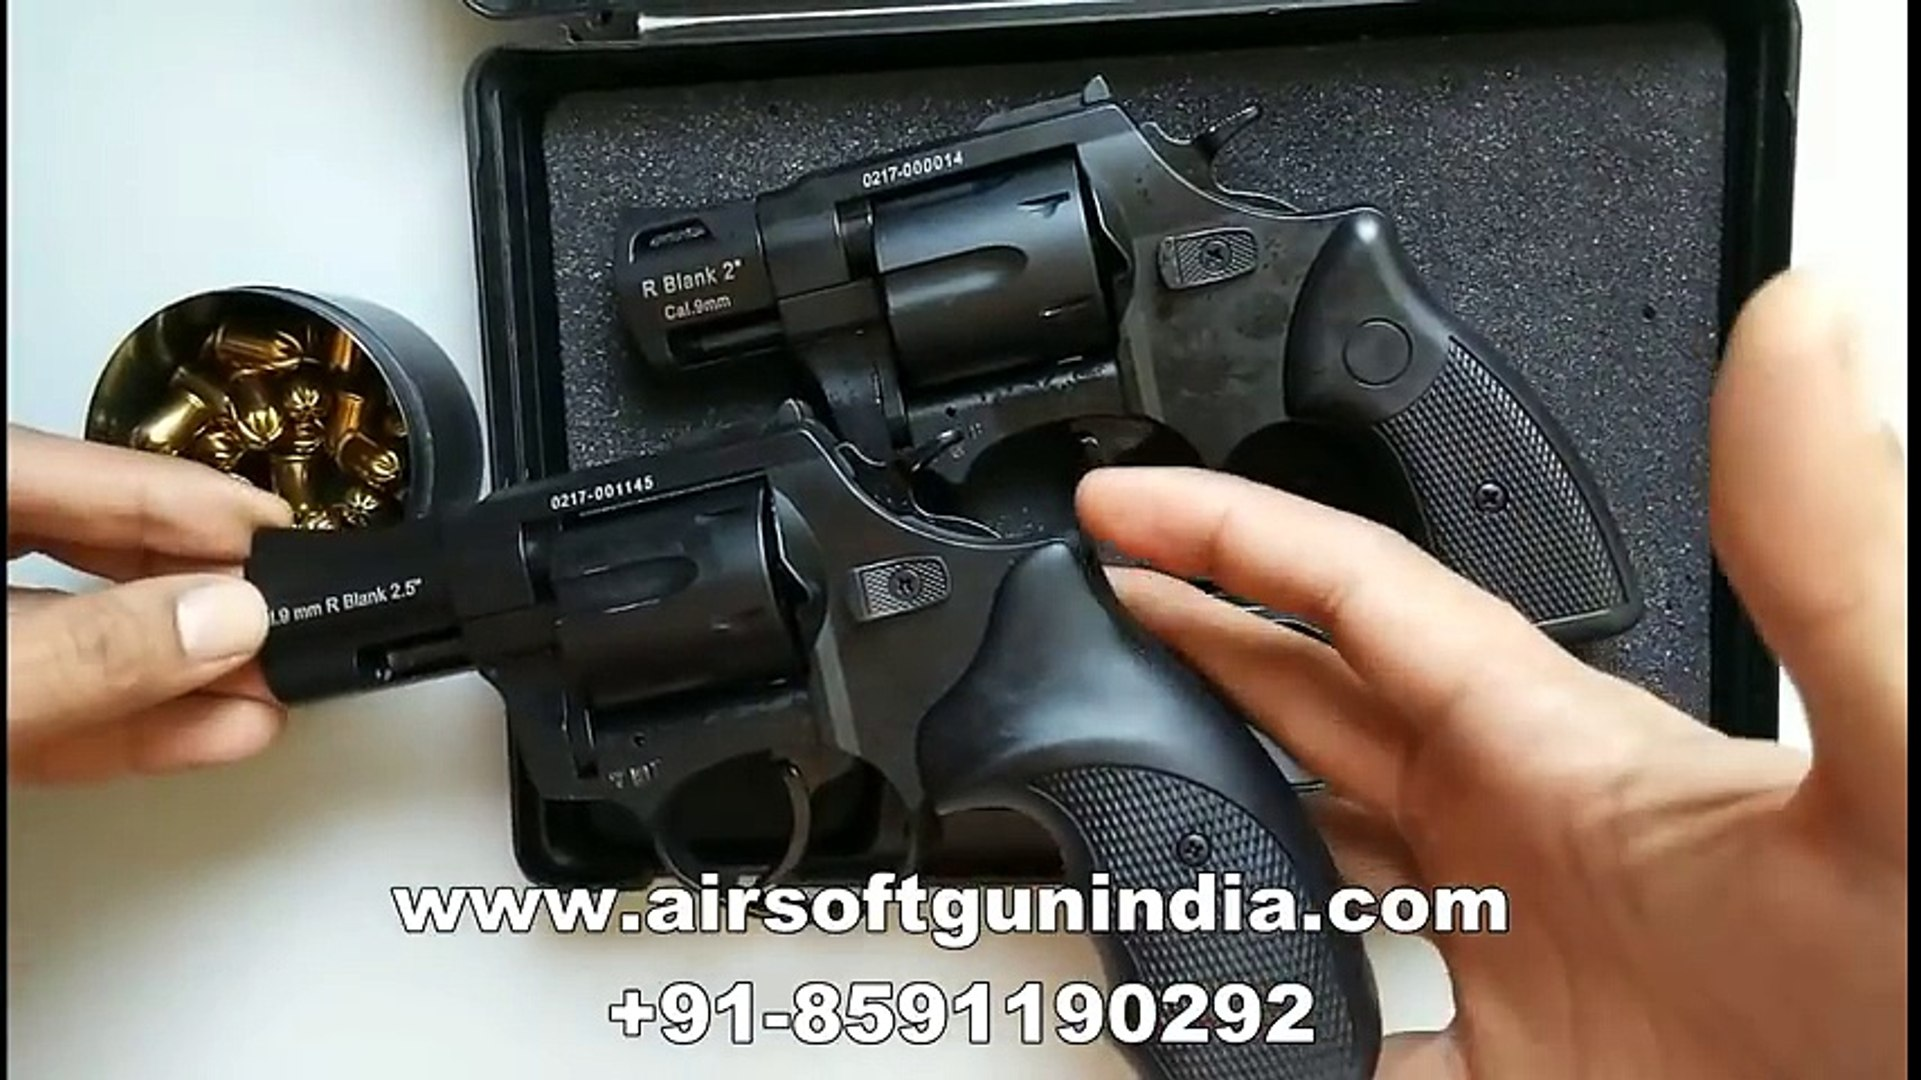 R2 2 BLACK ZORAKI 9MM FIRING REVOLVER by airsoft gun india